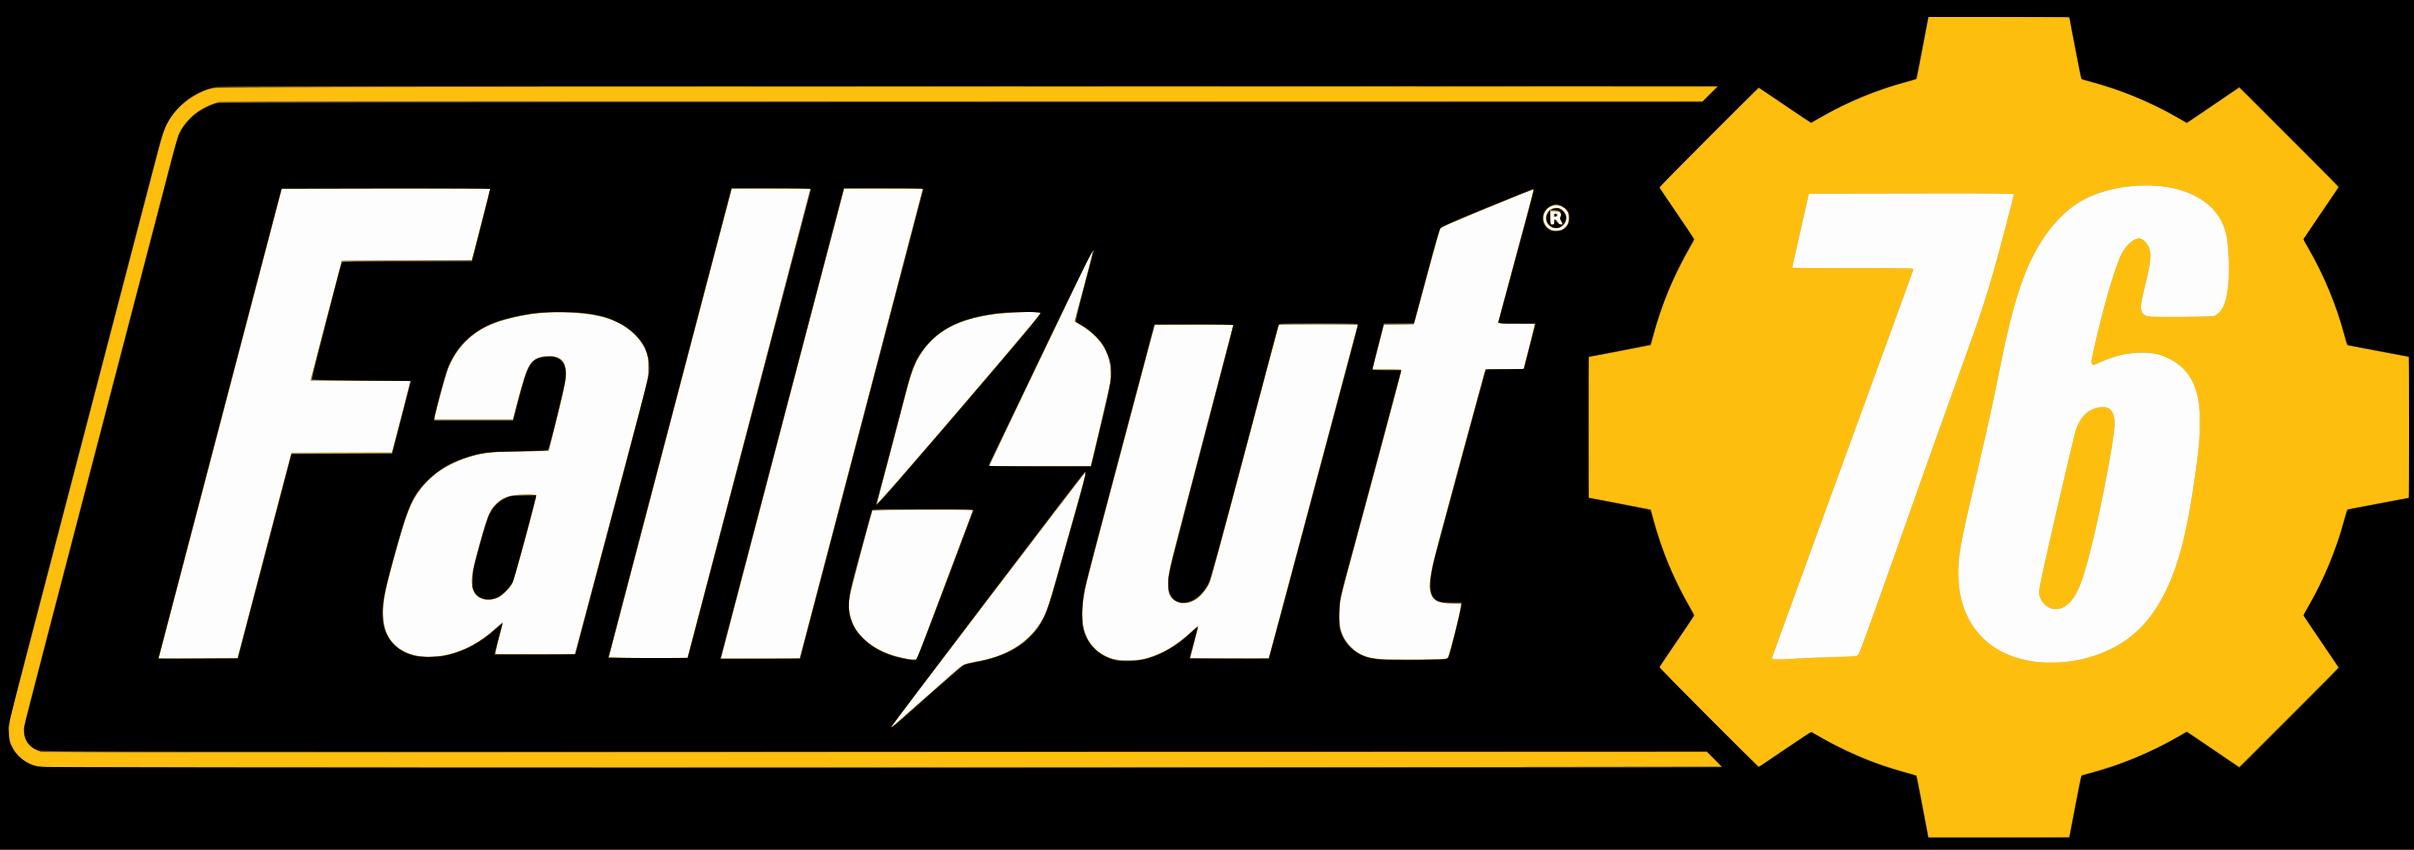 Fichier:Fallout76 logo.svg — Wikipédia.